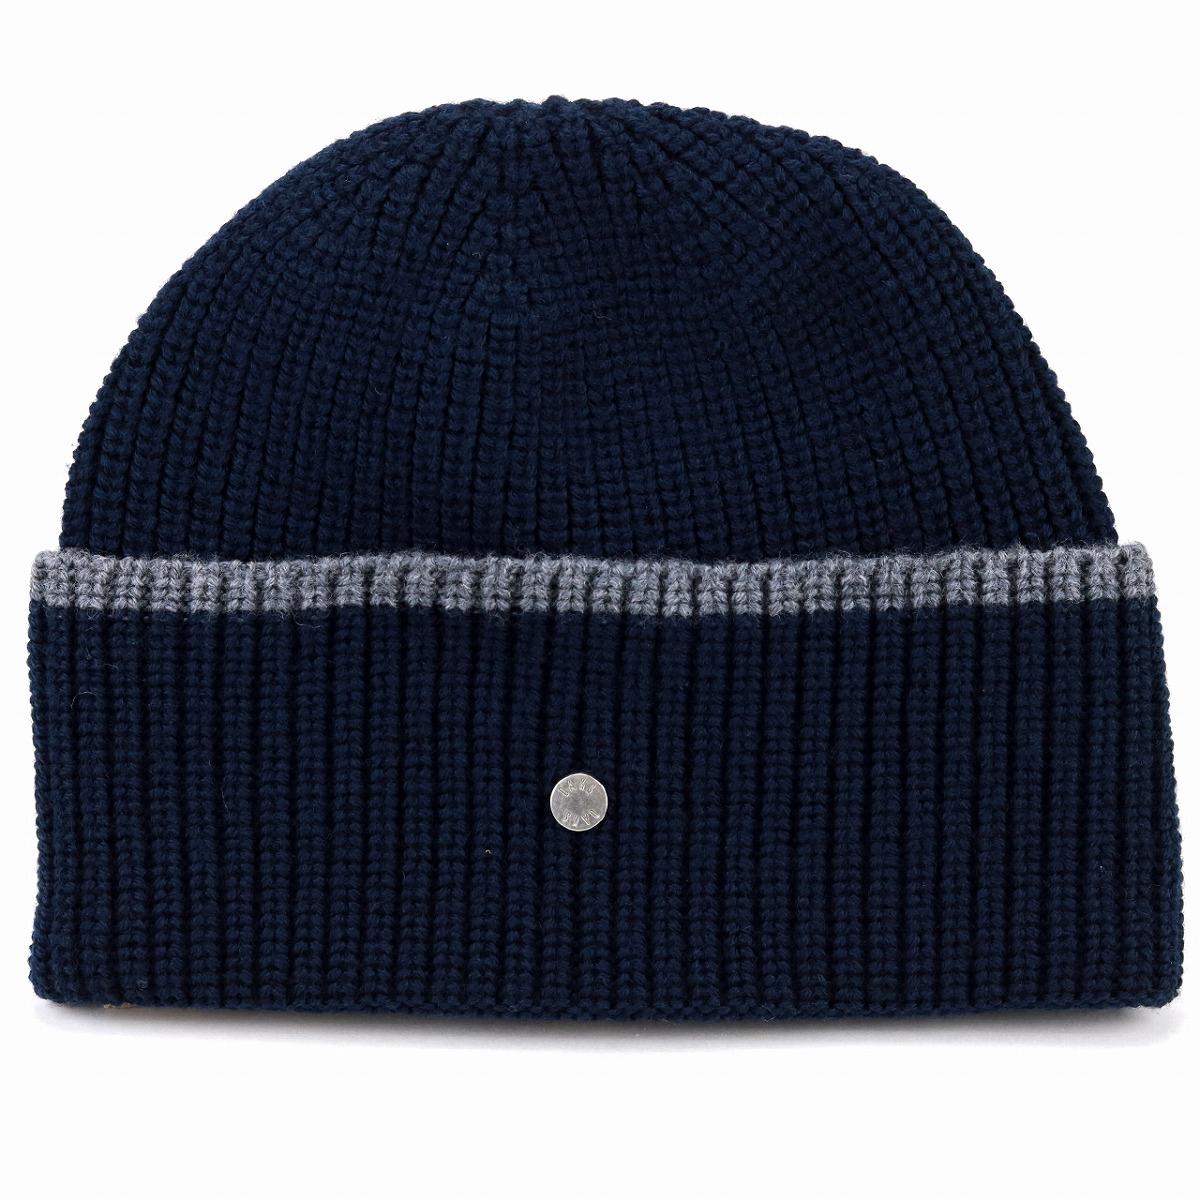 4bb707ce8bd Dark blue navy  beanie cap  man Christmas present hat with product made in  DAKS knit hat men merino wool lapel ニットワッチレディース hair 100% Daks hat ...